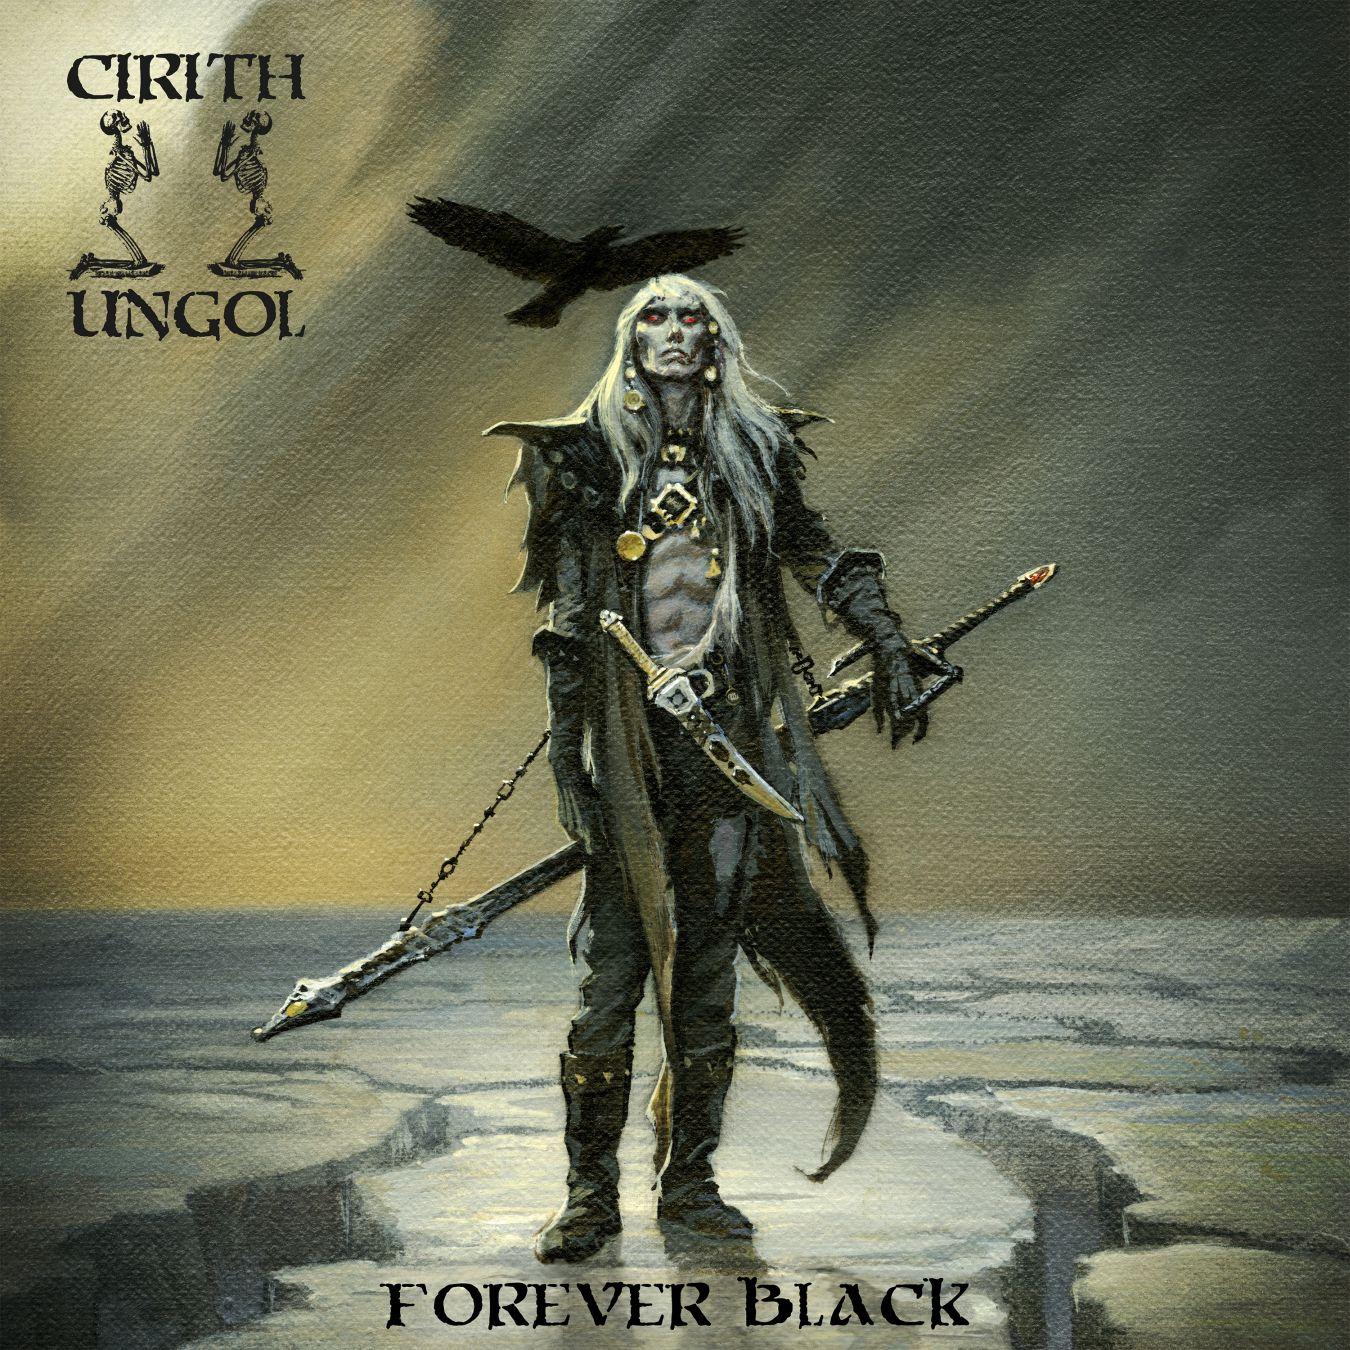 Cirith Ungol - Forever Black - Artwork